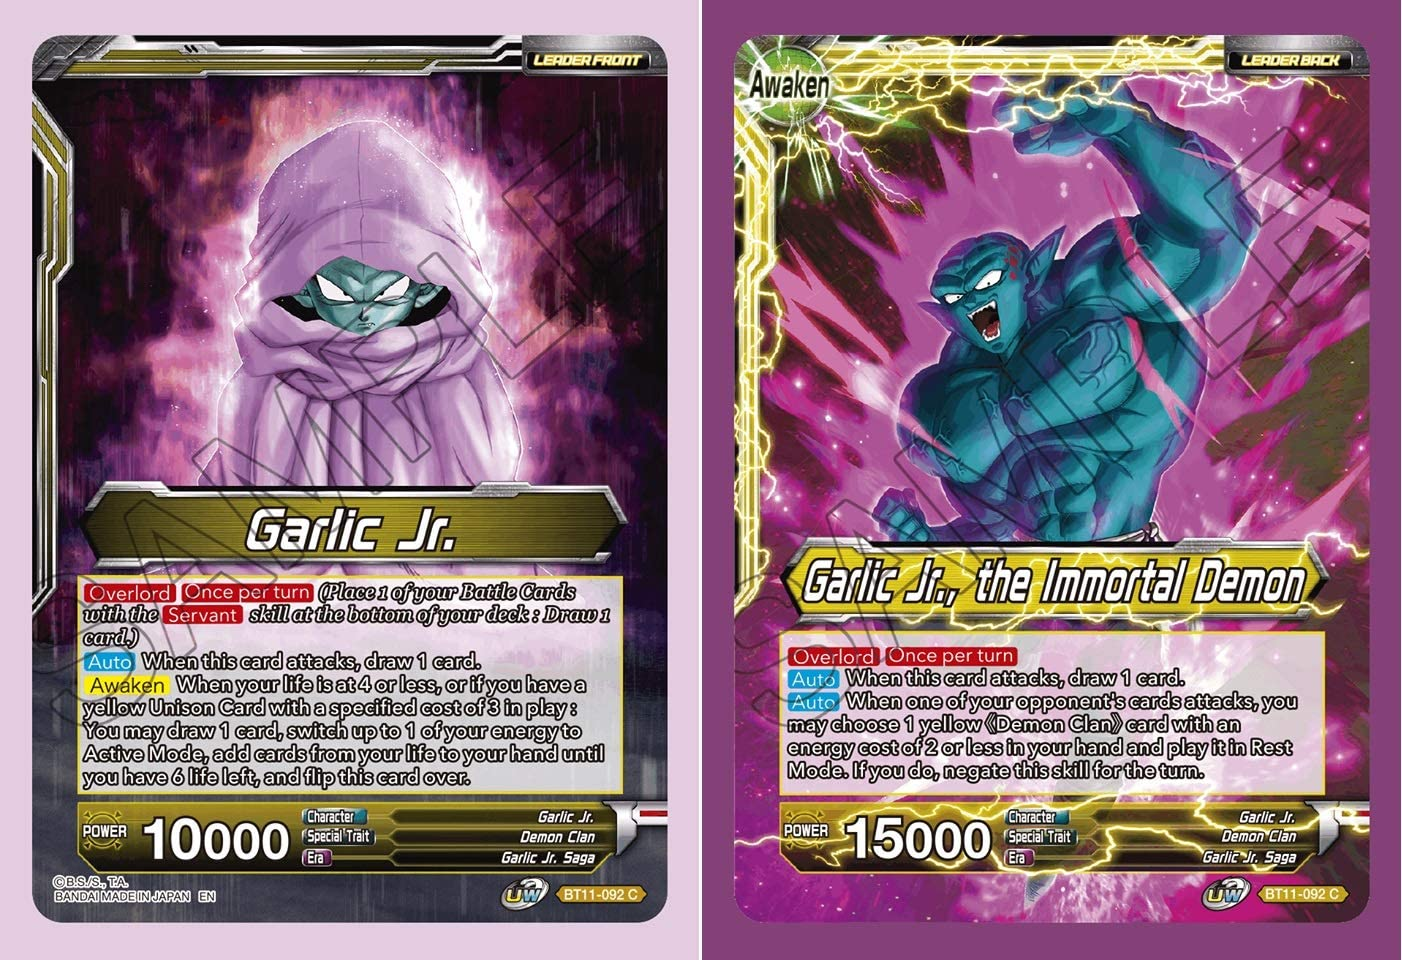 Amazon Com Garlic Jr Garlic Jr The Immortal Demon Bt11 092 C Toys Games // garlic jr., the immortal demon. amazon com